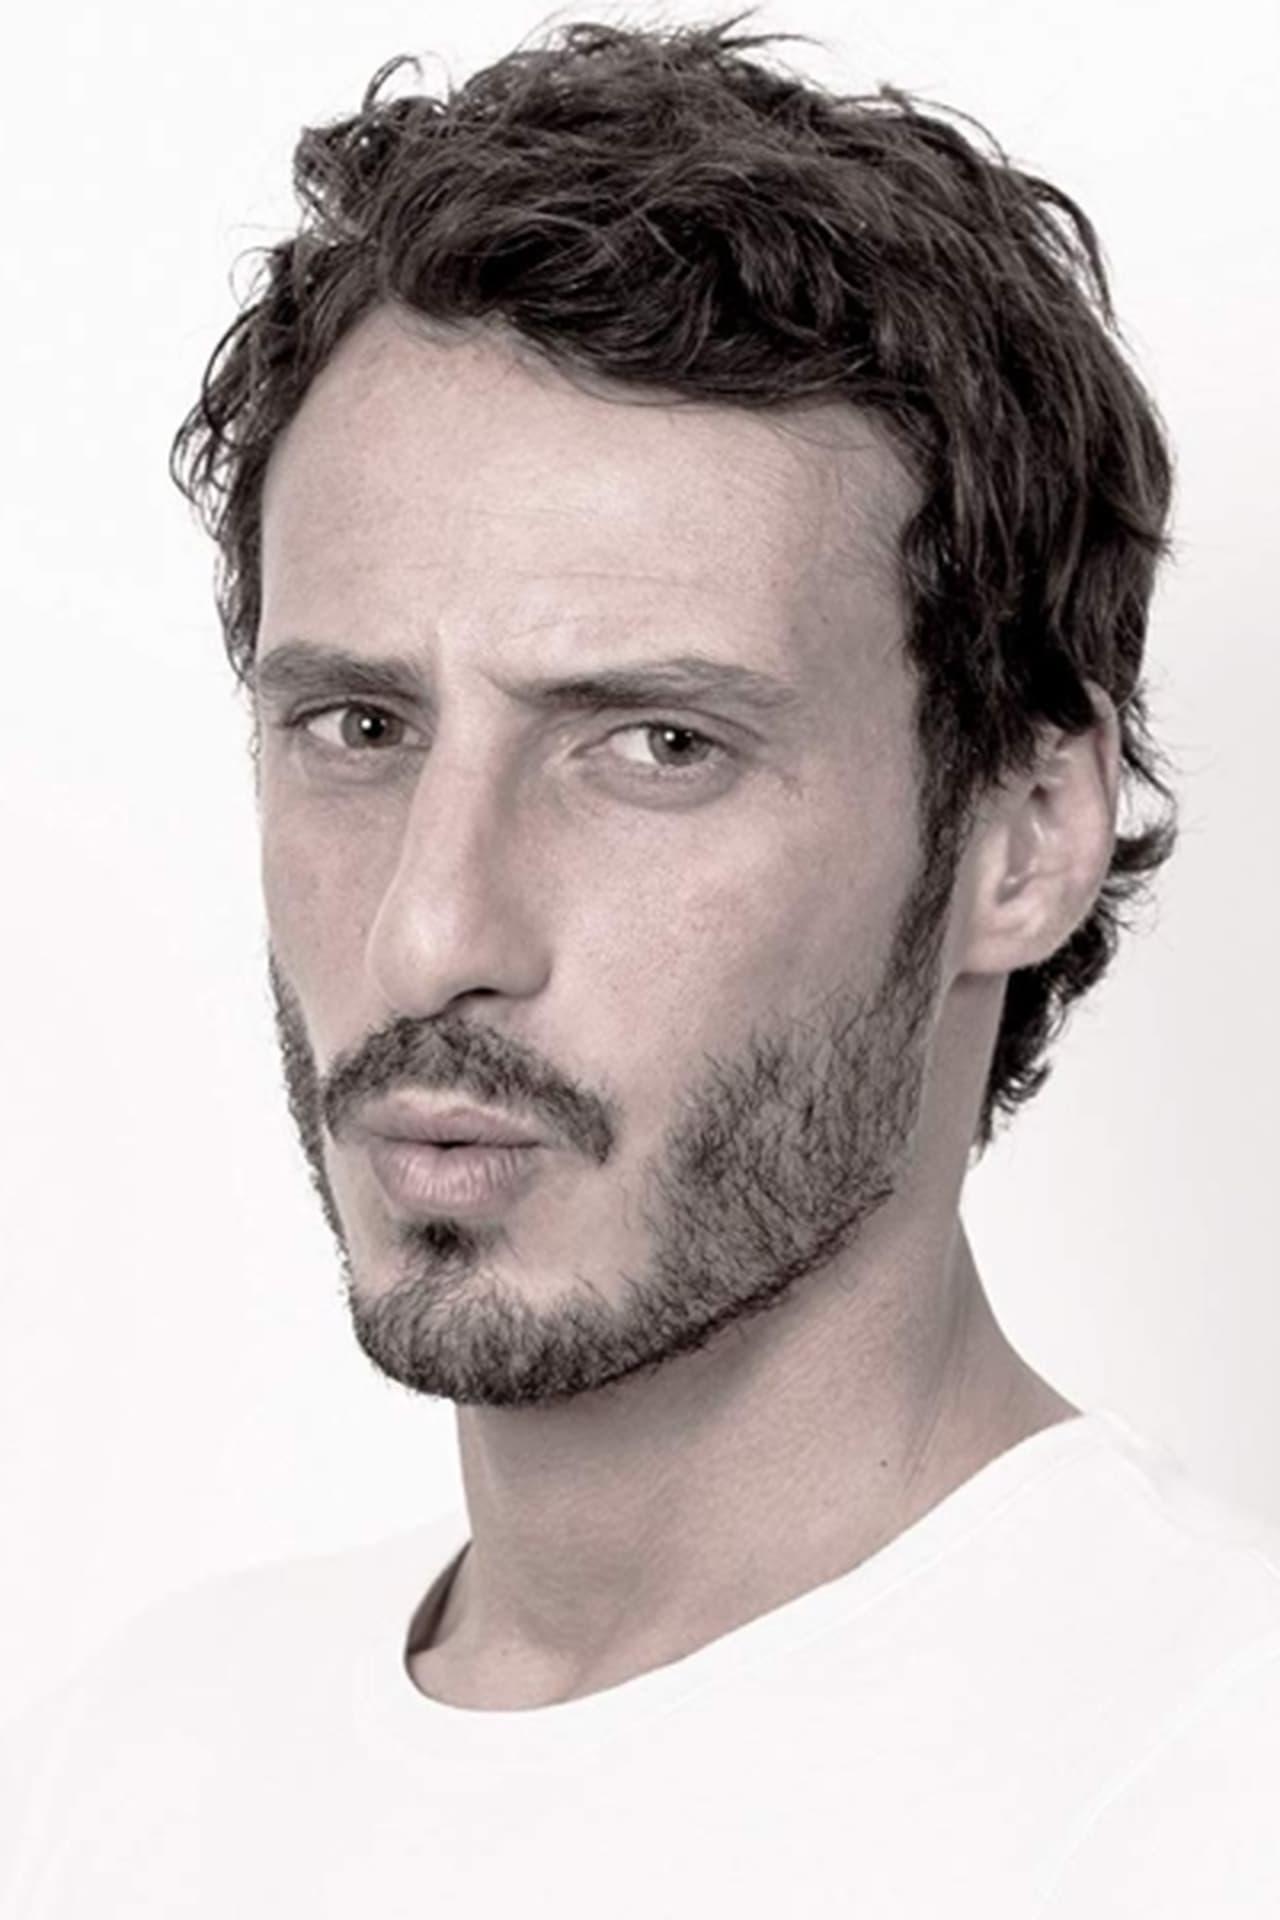 Sebastien Soudais